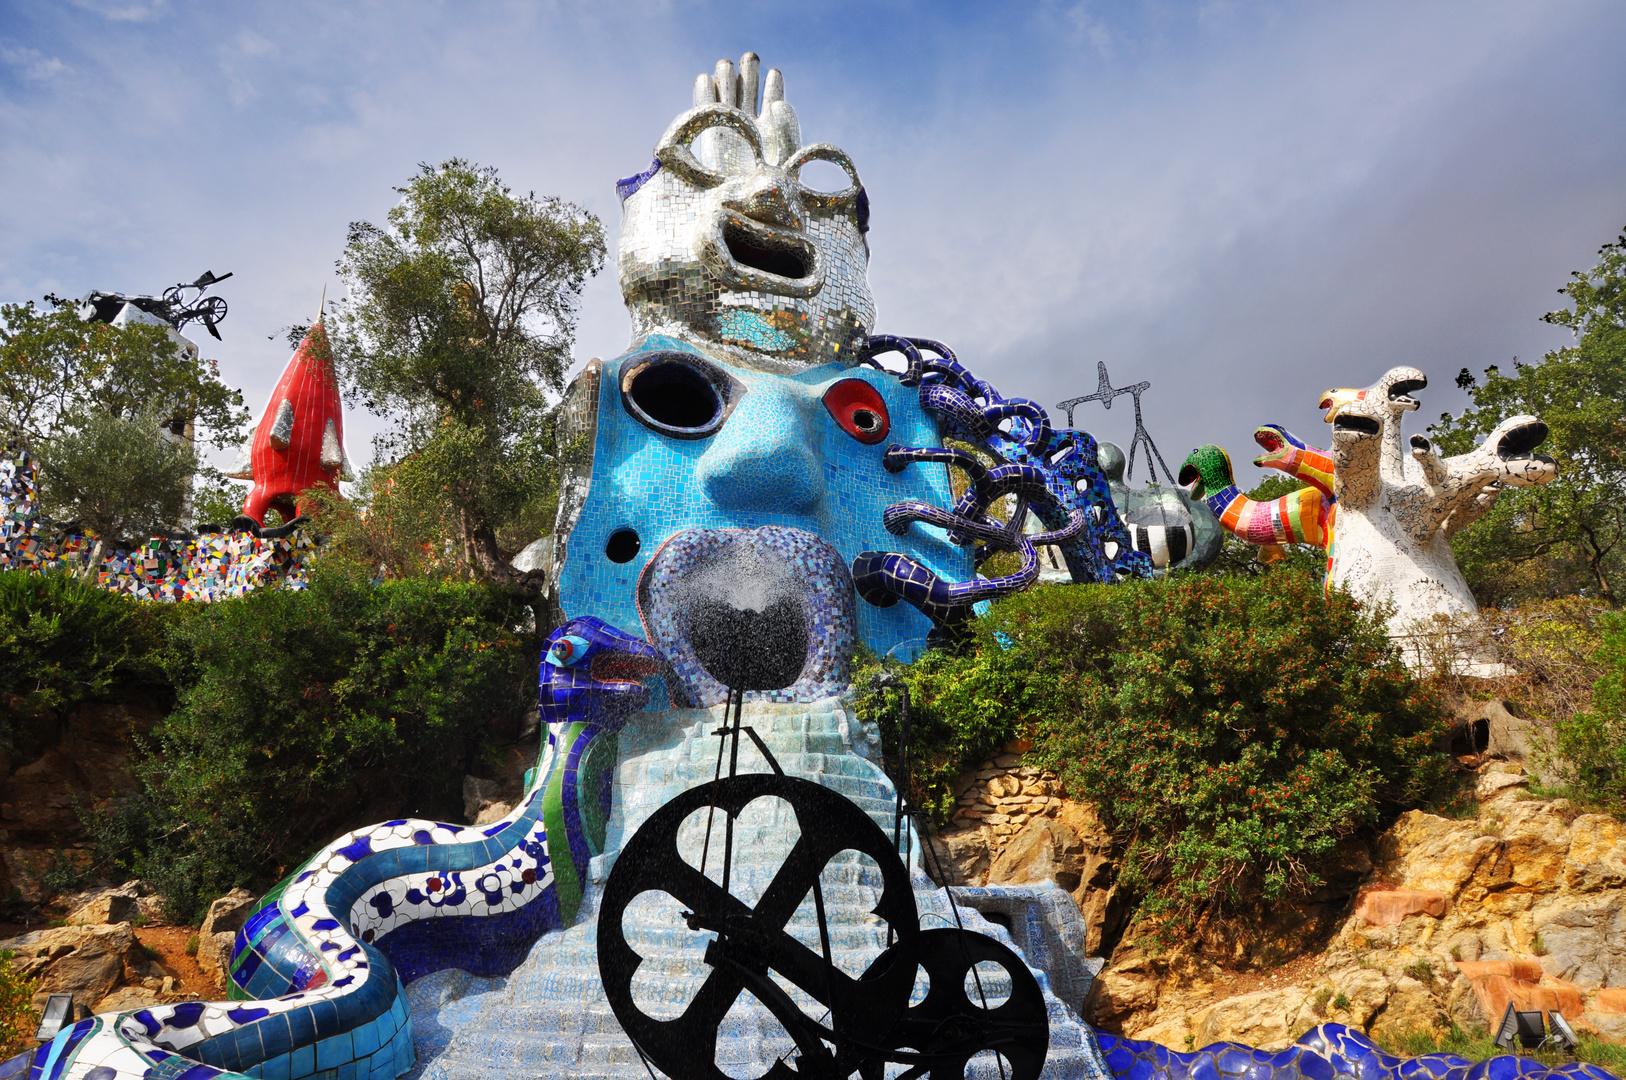 Niki de Saint Phalle Park